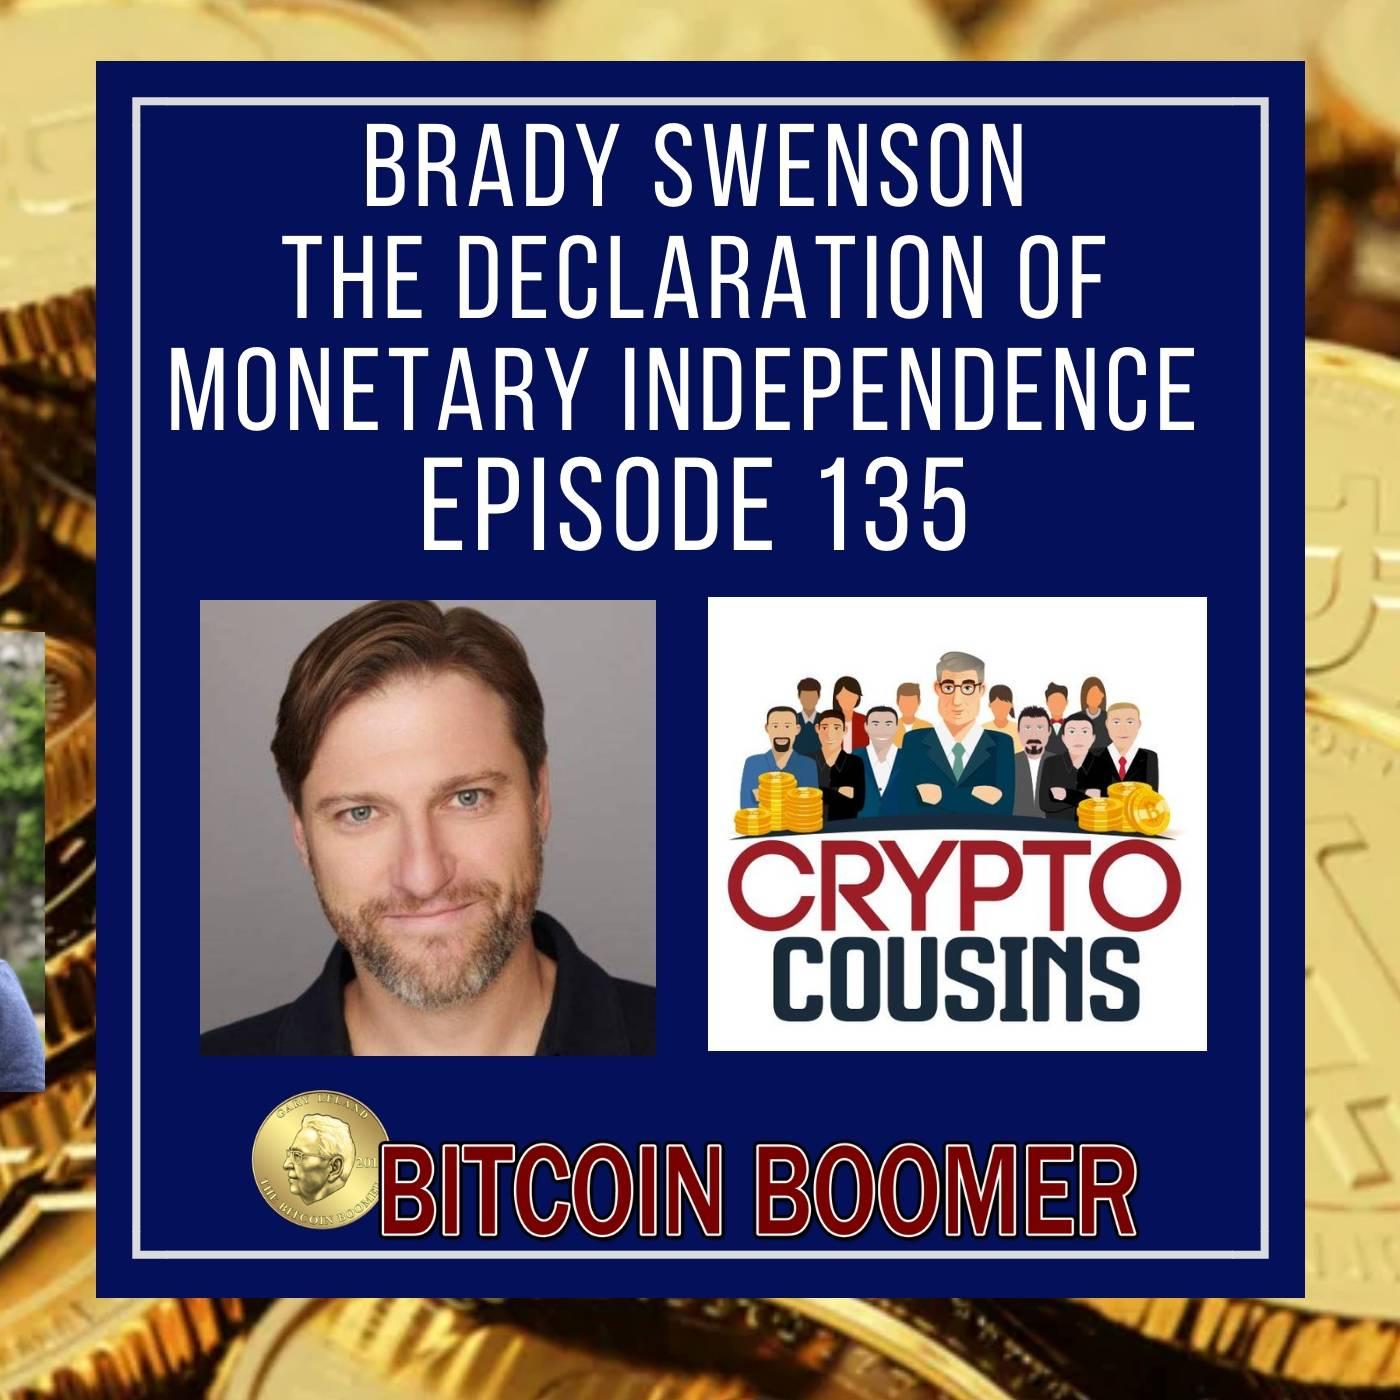 The Declaration of Monetary Independence - Brady Swenson